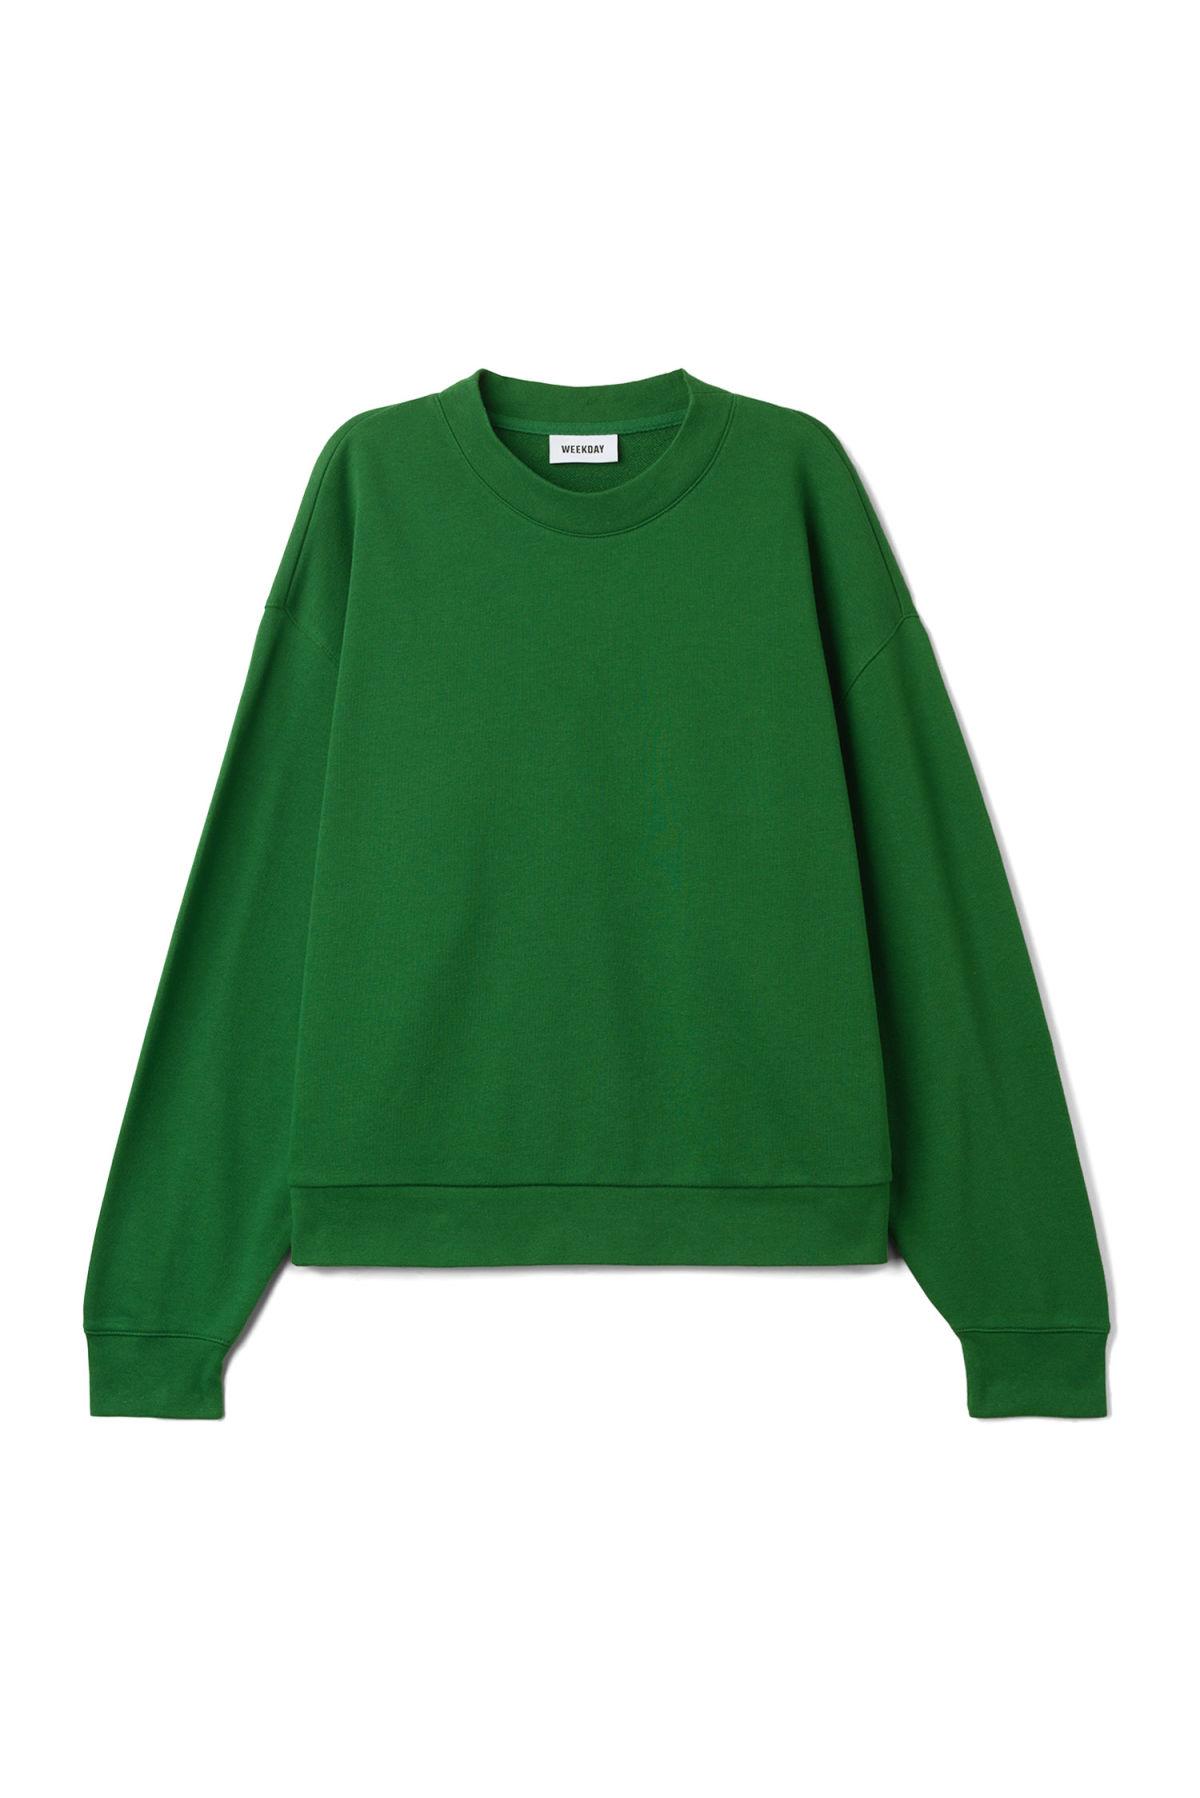 fafdceda8892 Hoodies & Sweatshirts Dam | Shoppa Outlet Deals | Afound